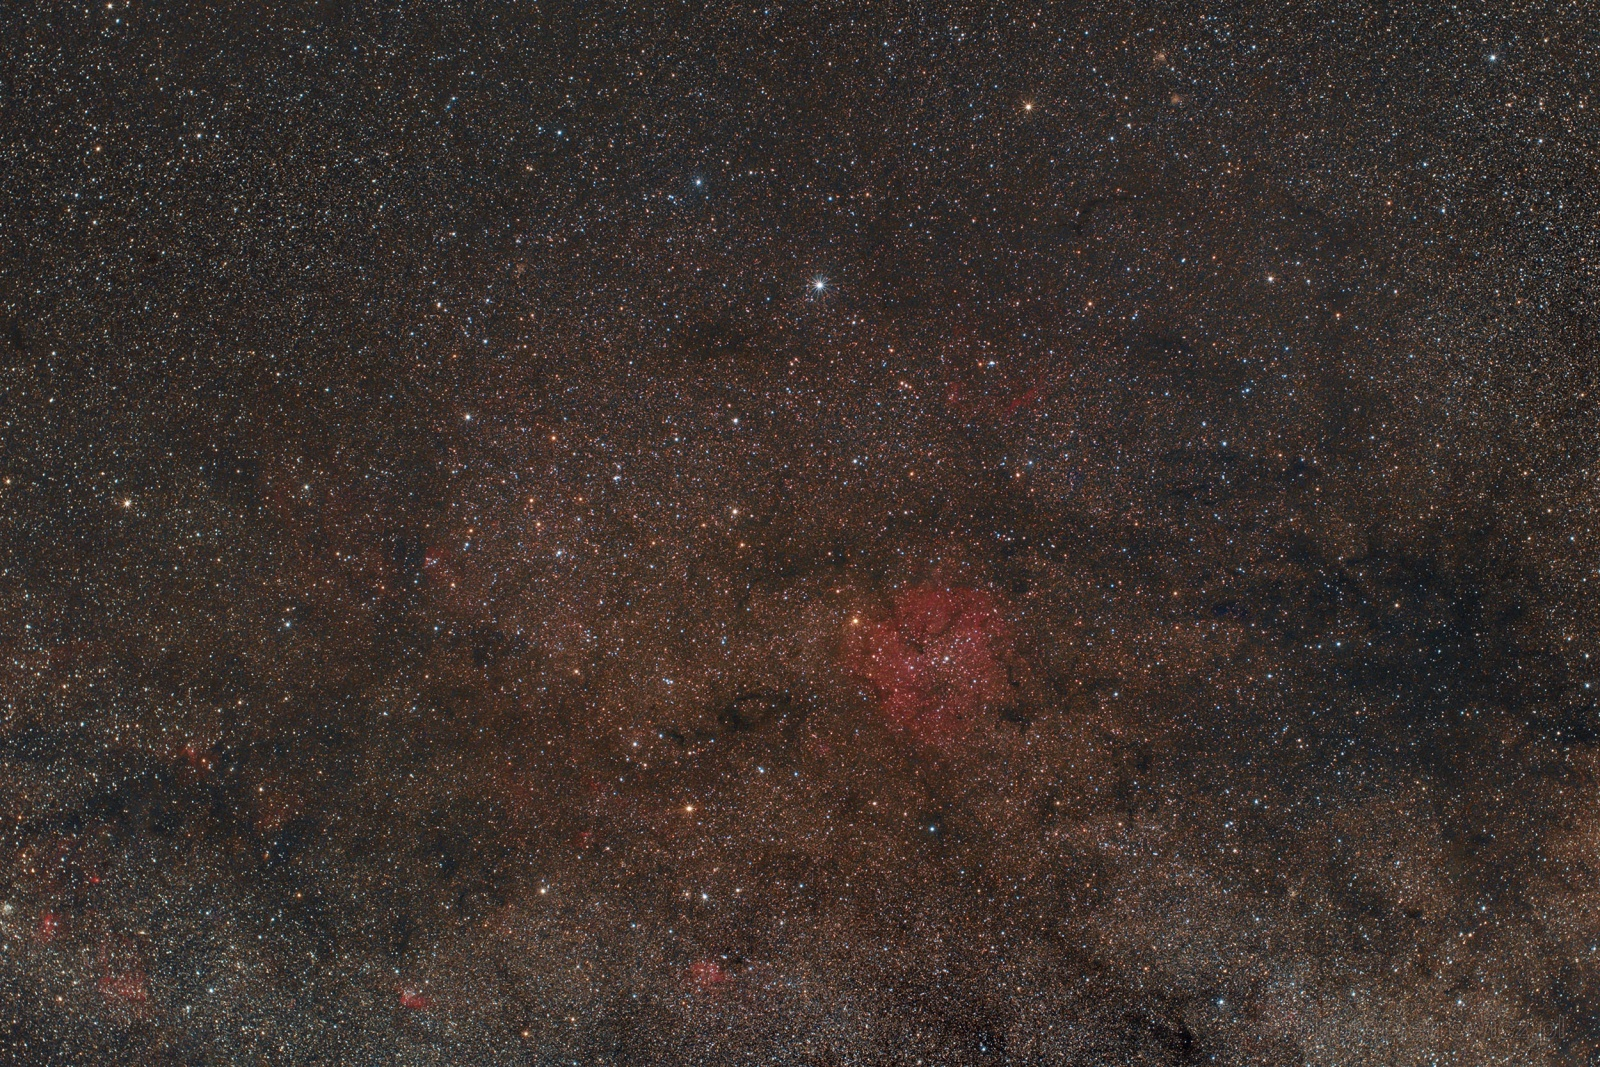 IC1396_WIDEFIELD-RGB-fb_AP.thumb.jpg.b7f1ab1ac6bd8da4420ee853a9285650.jpg